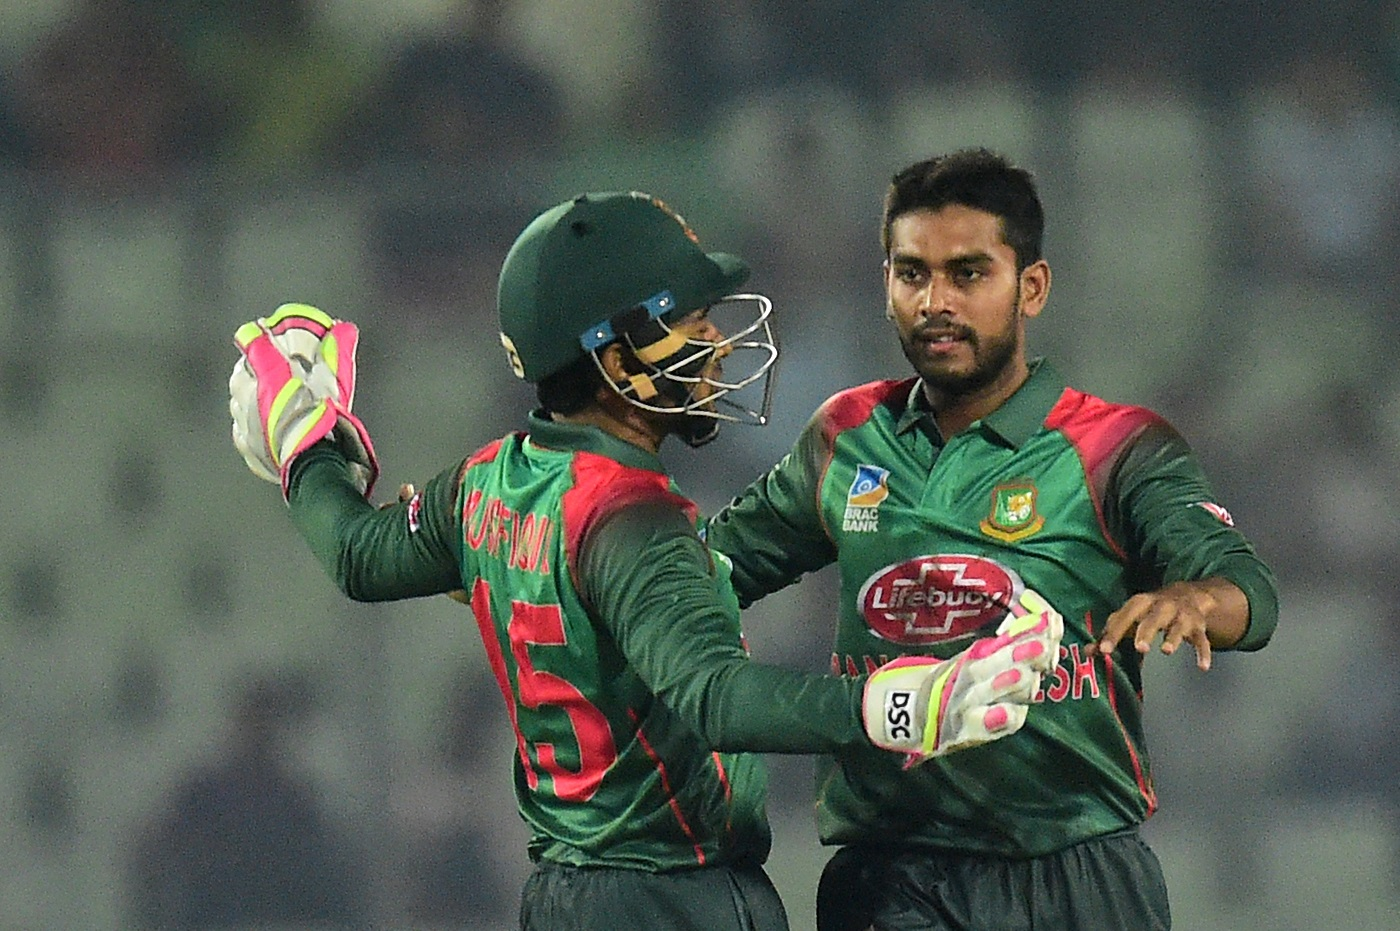 BangladeshI cricketer Mehidy Hasan (R) celebrates with teammate Mushfiqur Rahim (L) (Photo by MUNIR UZ ZAMAN / AFP)